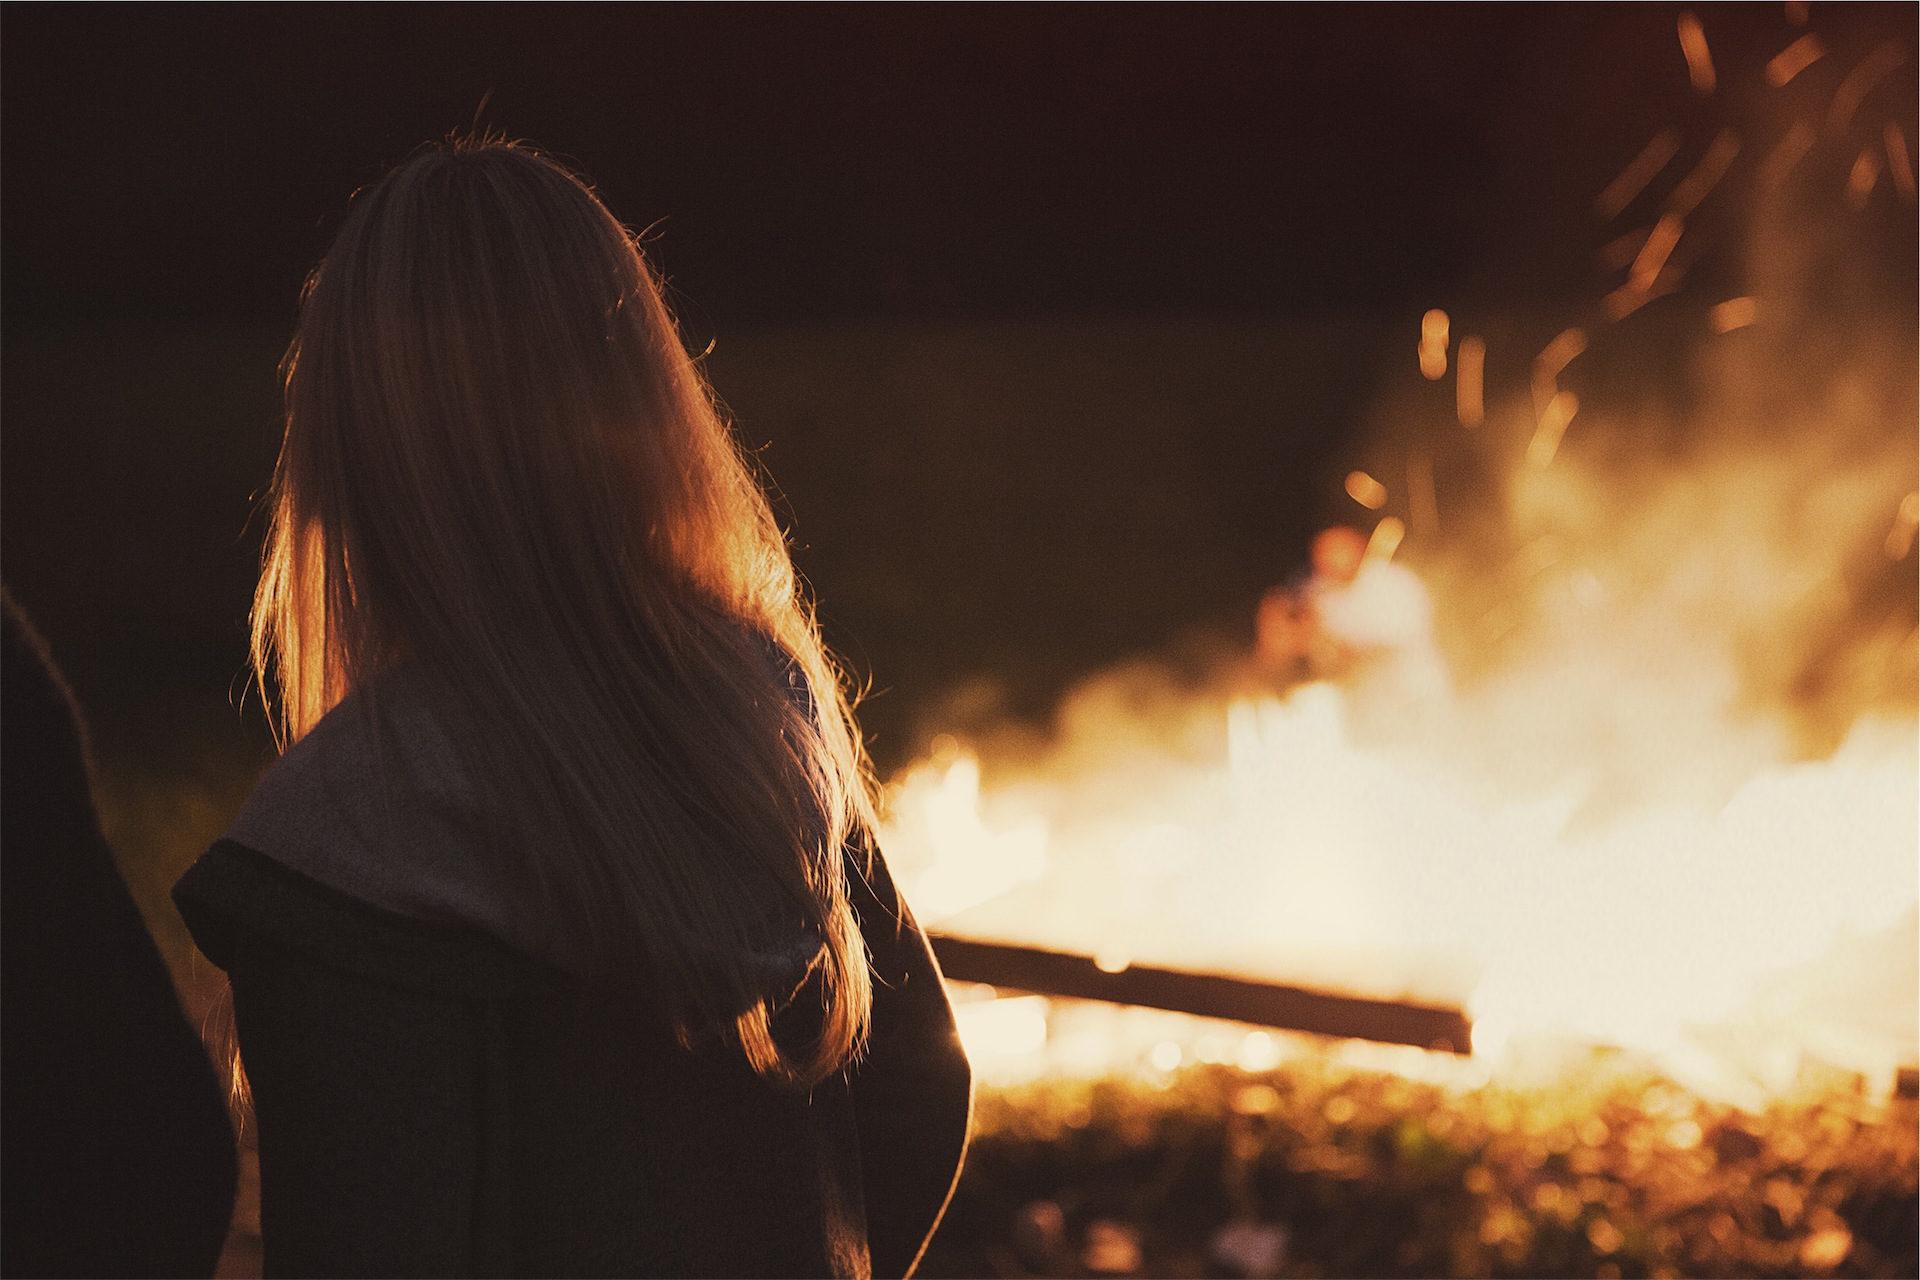 feu de joie, feu, femme, Sweat-shirt, nuit - Fonds d'écran HD - Professor-falken.com